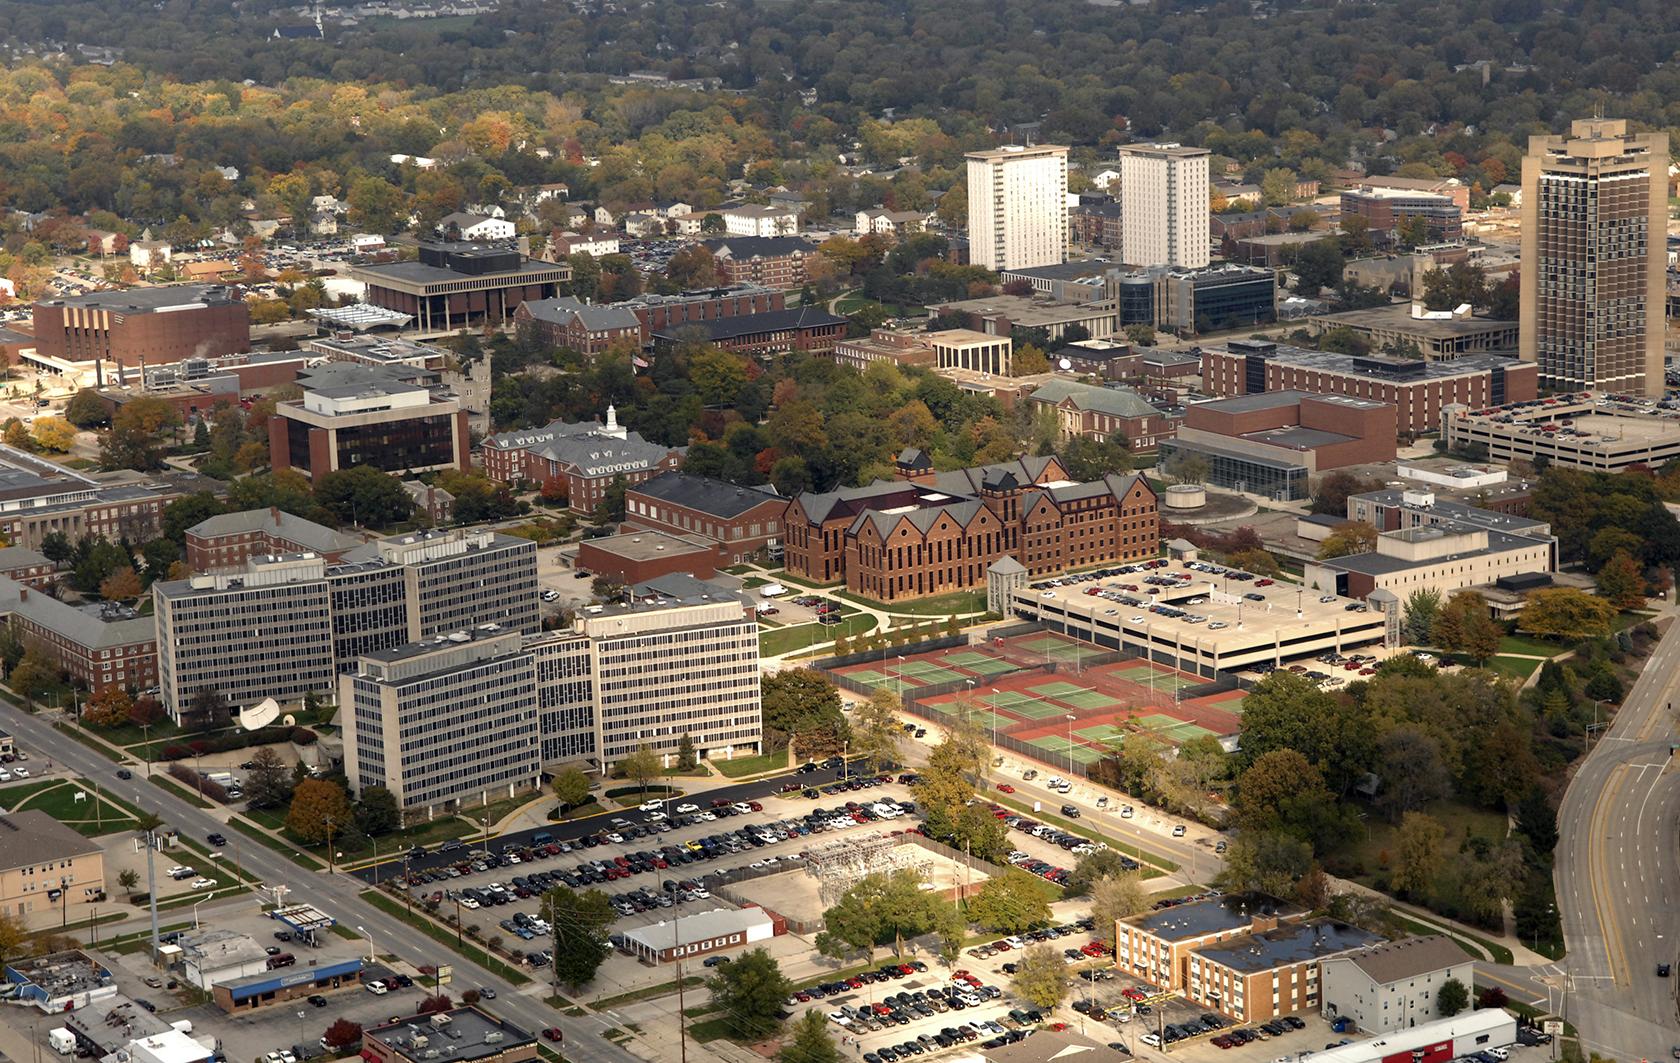 Aerial view of campus looking NE